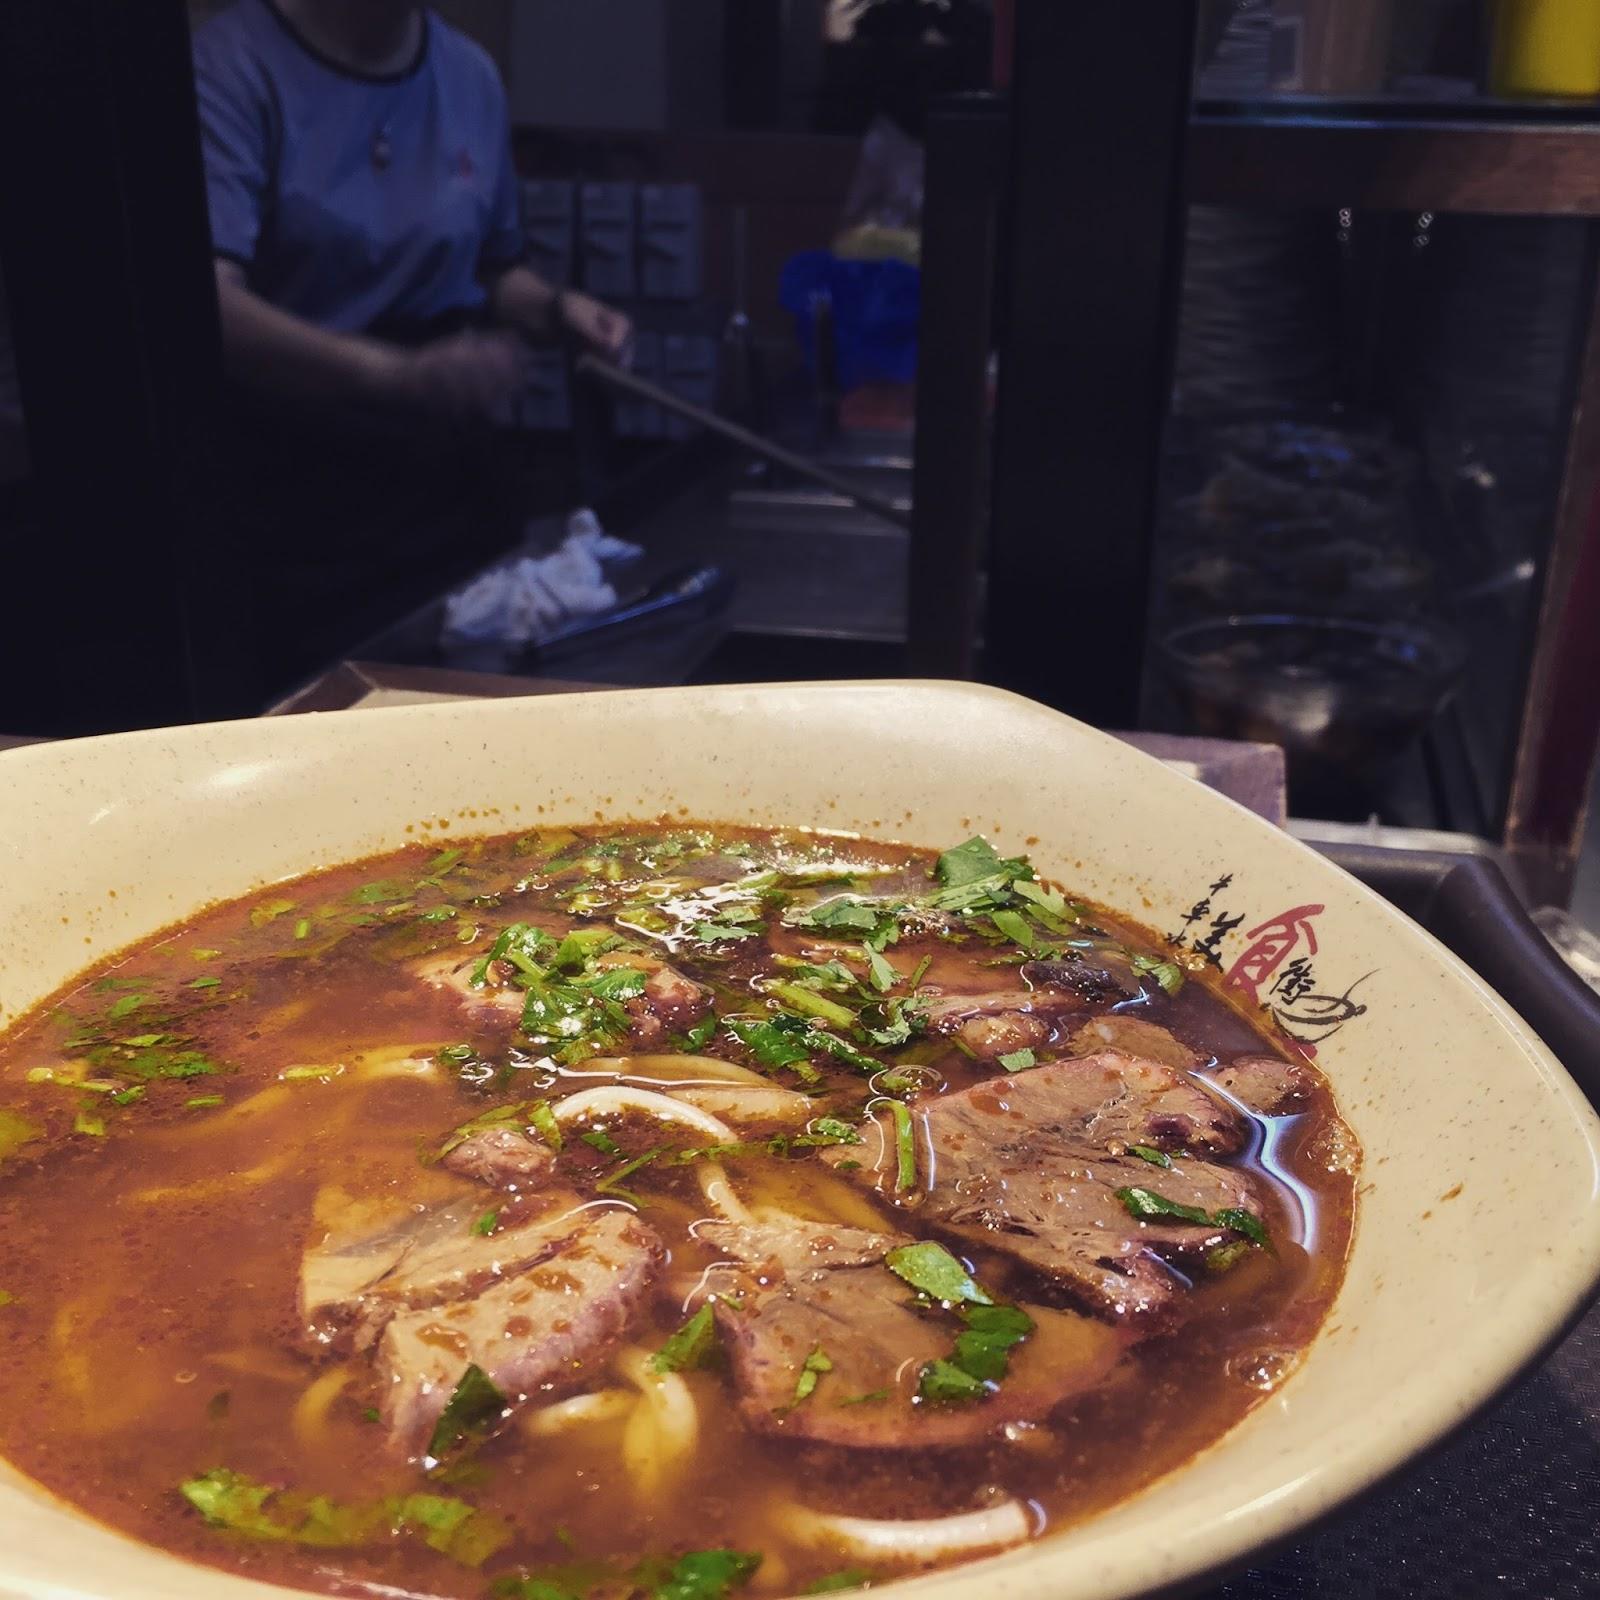 Chinatown Food Street - Spicy Beef Brisket Noodle